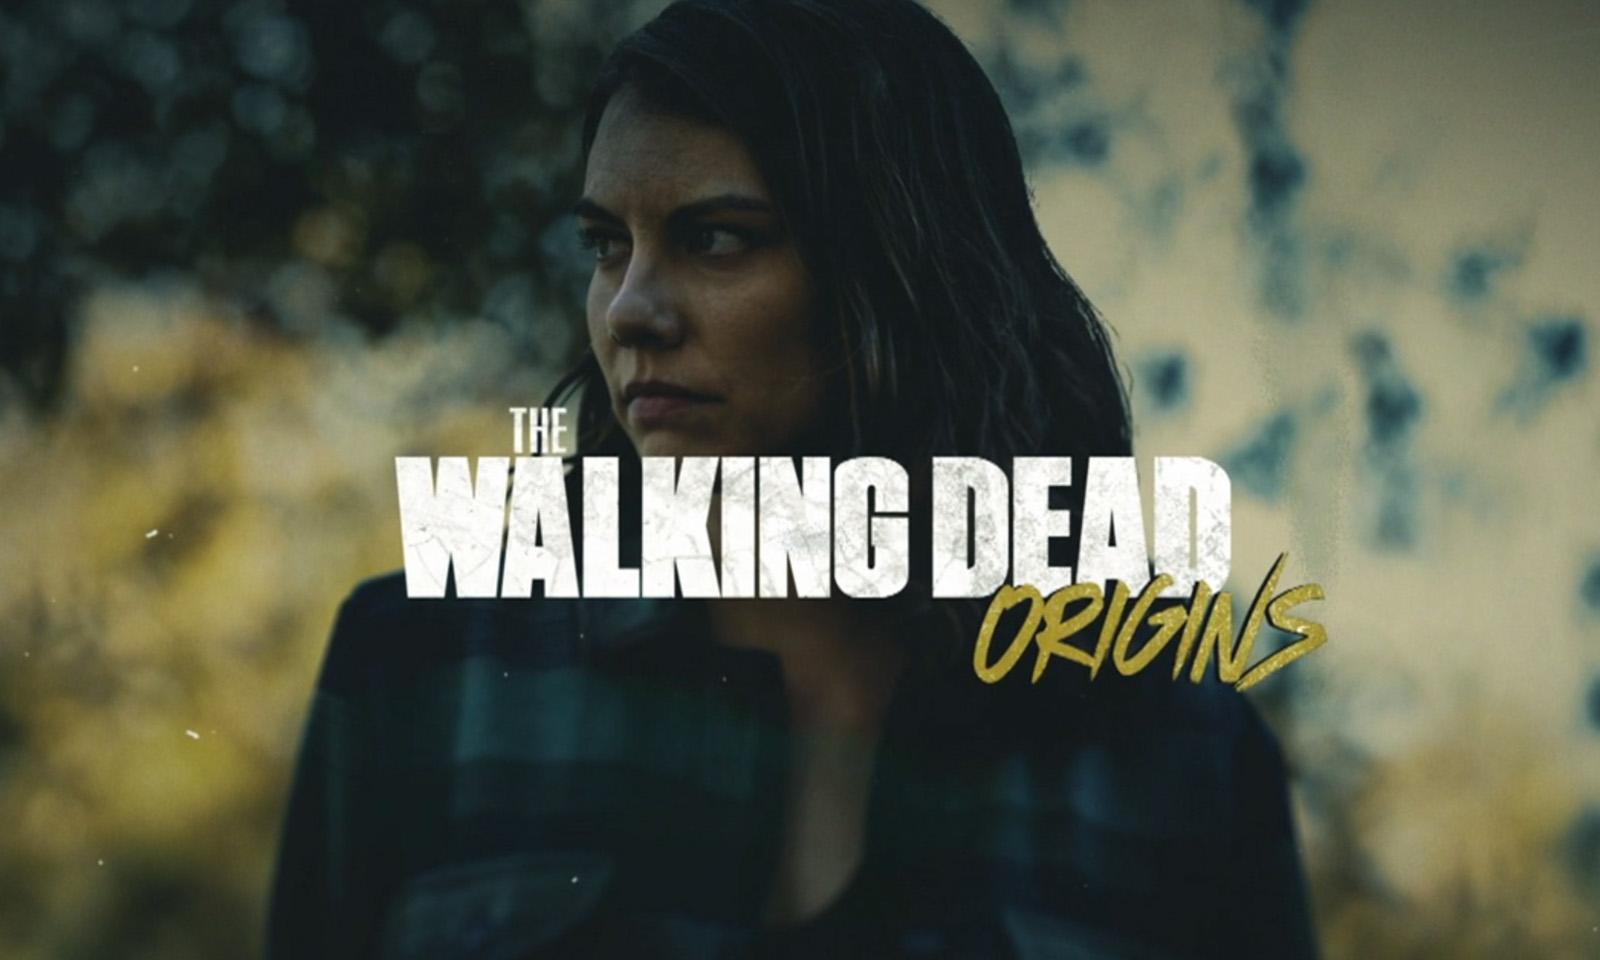 Pôster de The Walking Dead: Origins - Maggie Rhee